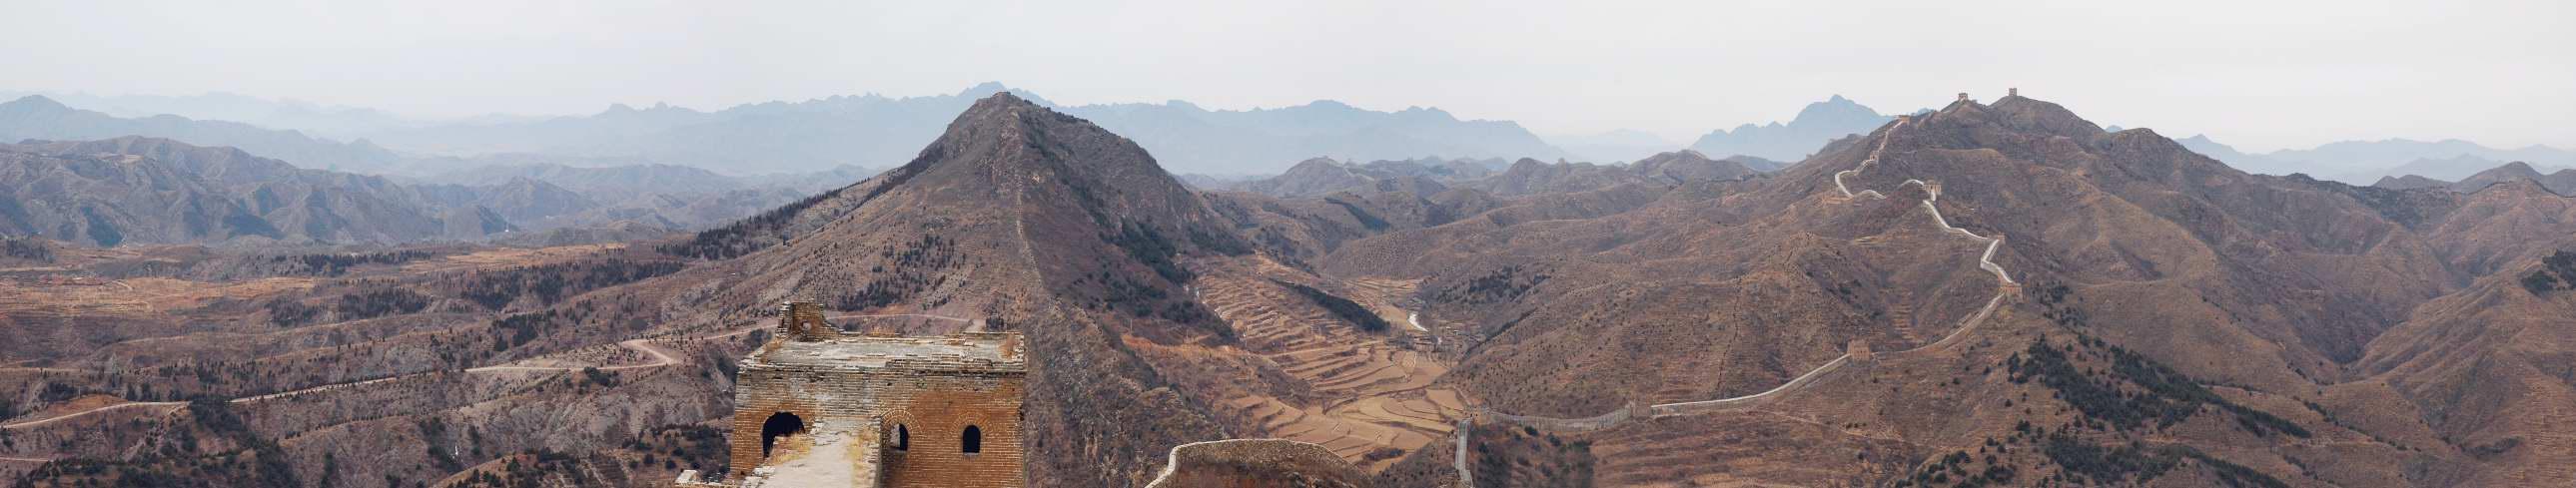 Peking #18 - Simatei neue Perspektive